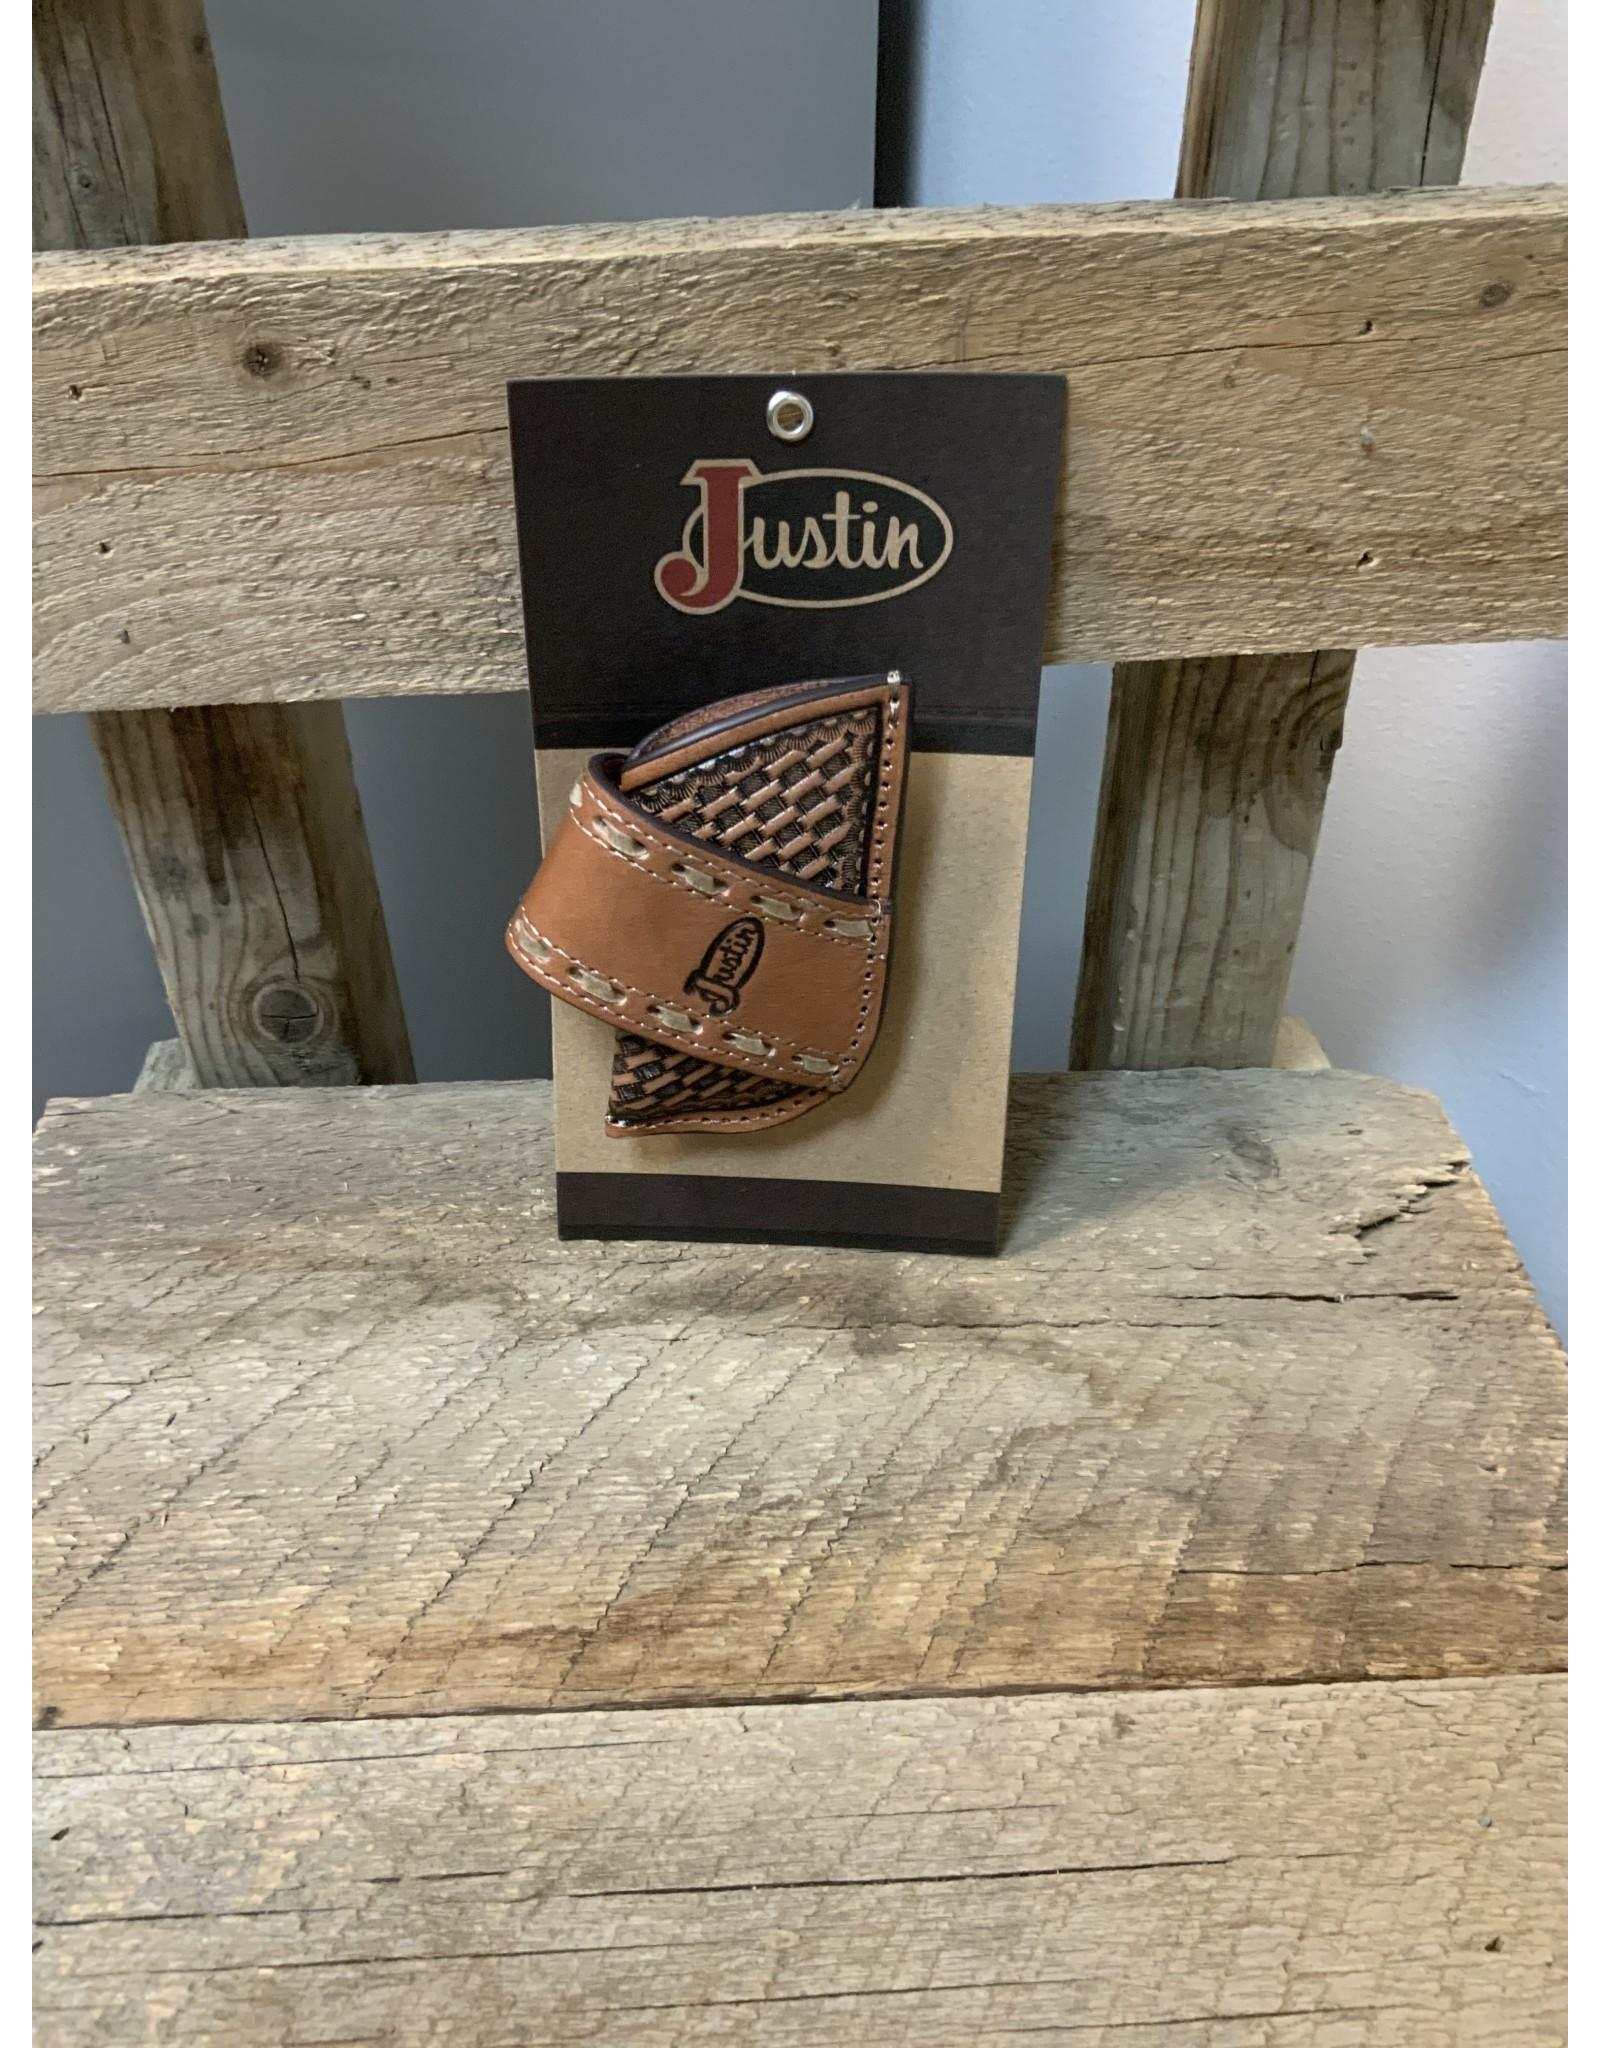 JUSTIN KNIFE SHEATH BASKETWEAVE TOOLING